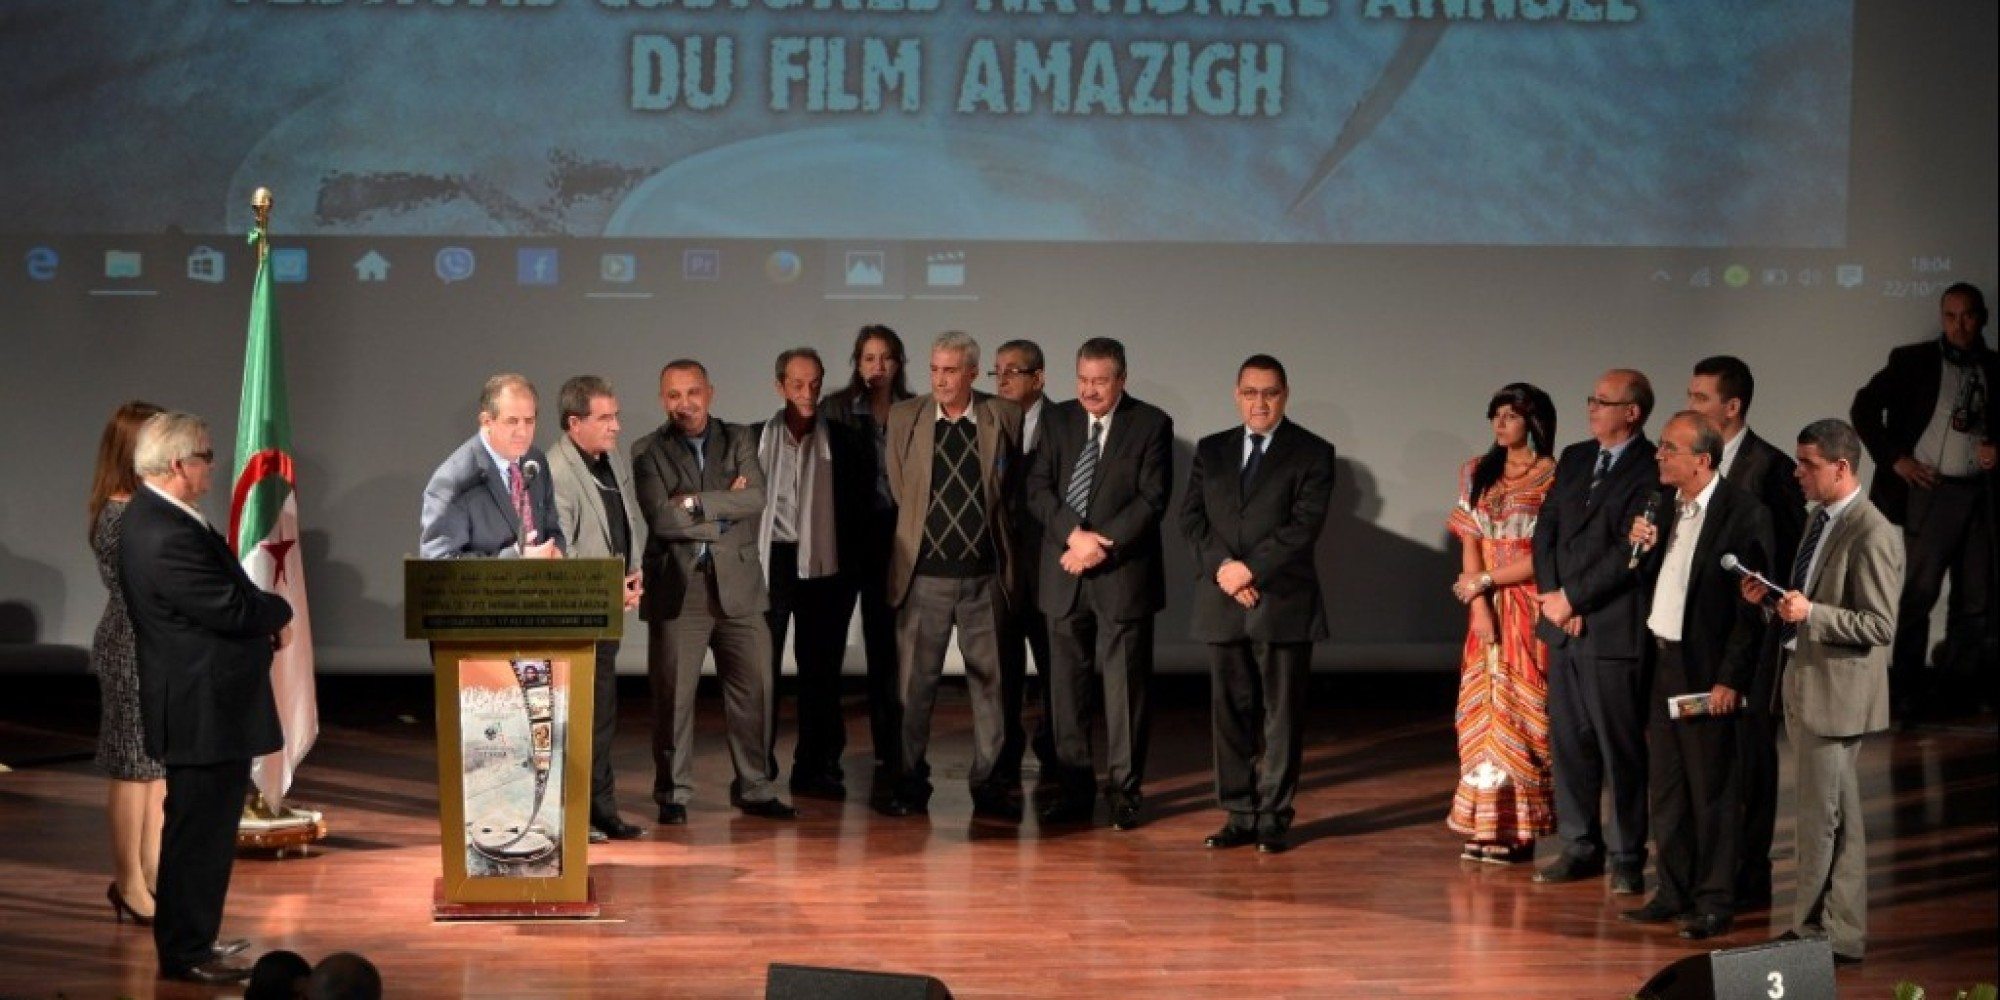 festival_film_amazigh